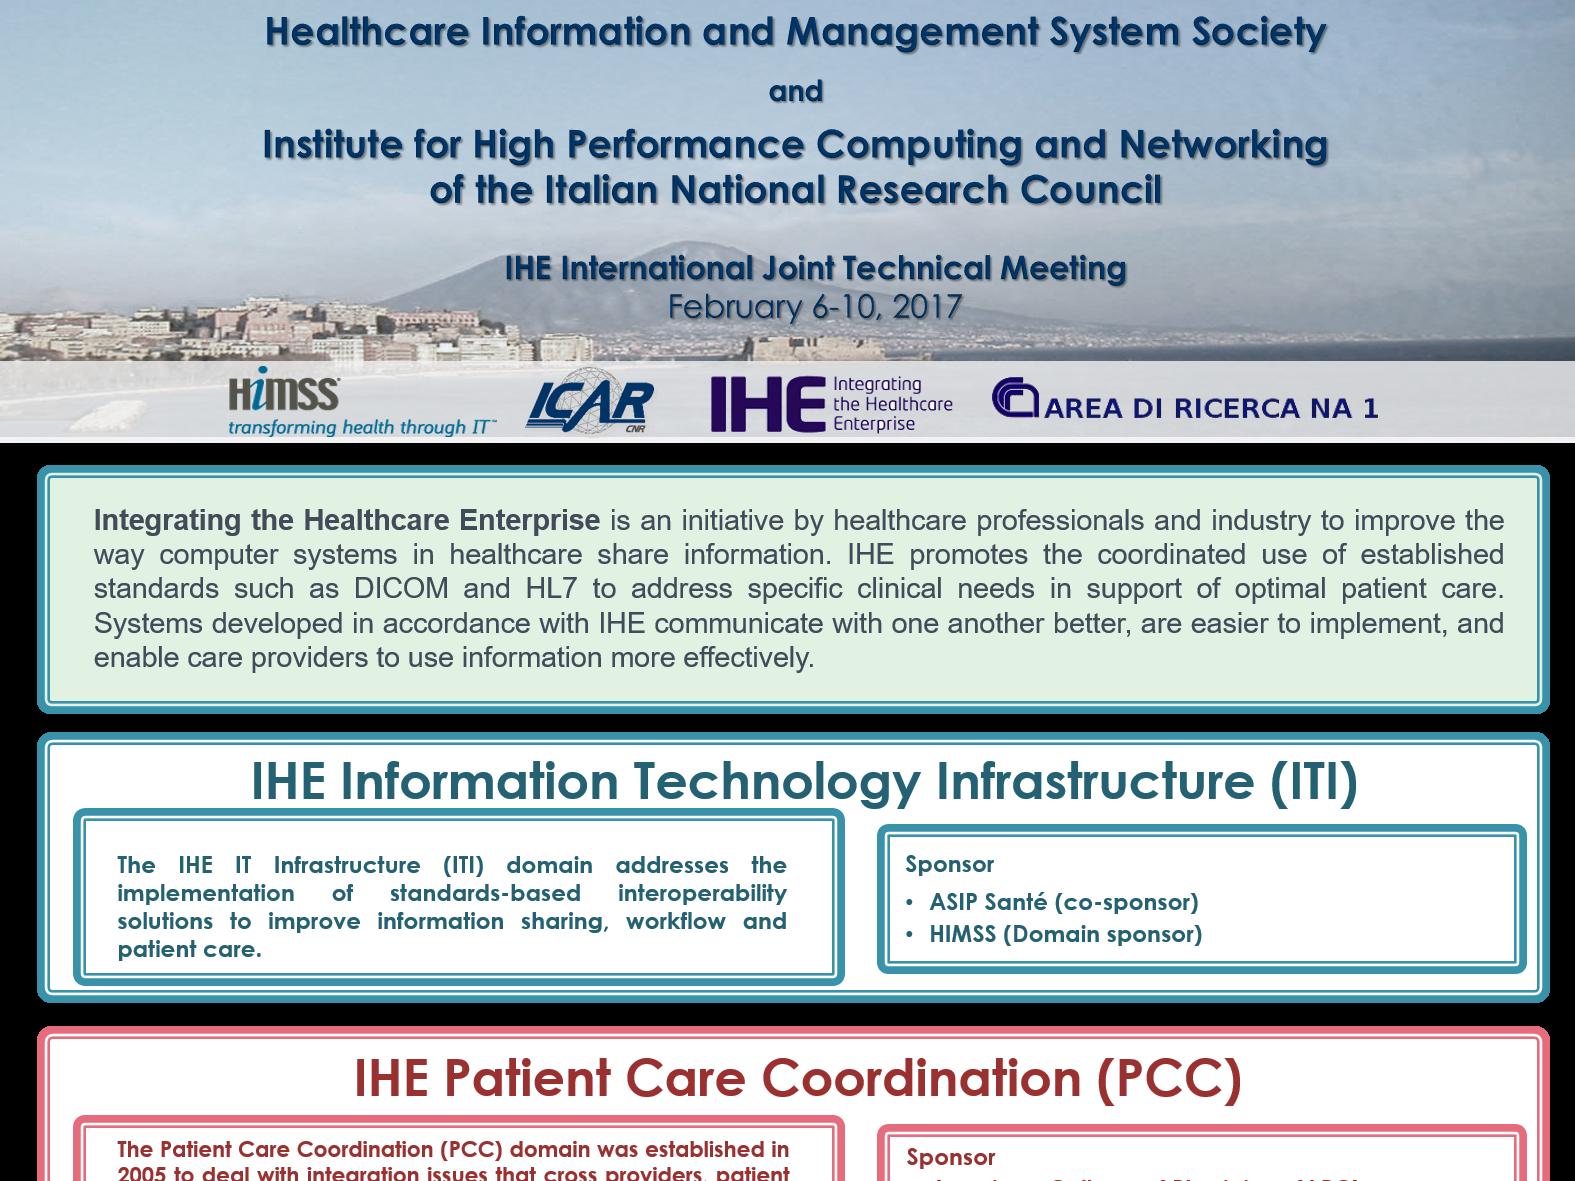 IHE International Joint Technical Meeting